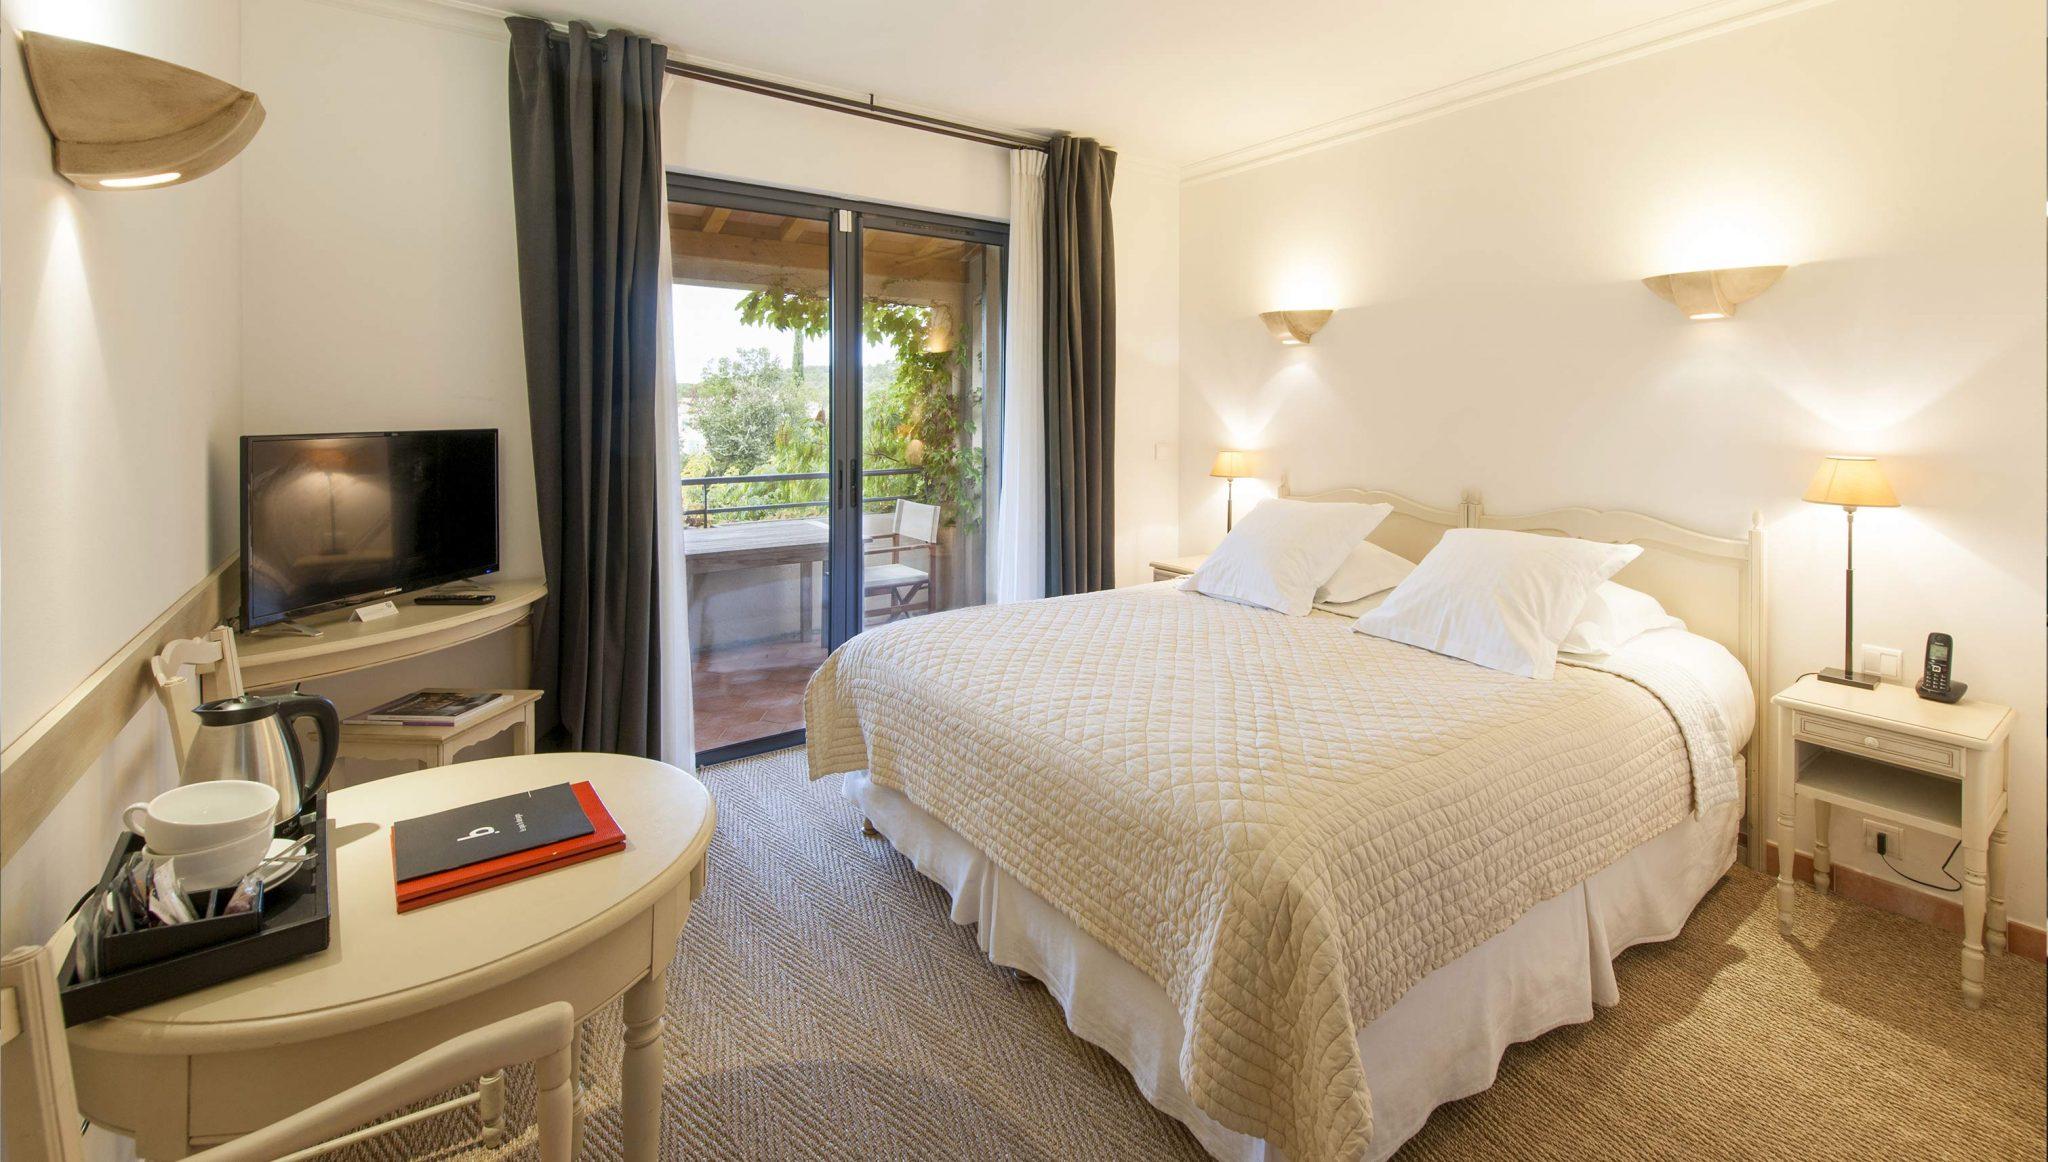 H bergements tarifs du c t des olivades for Chambre hotel charme